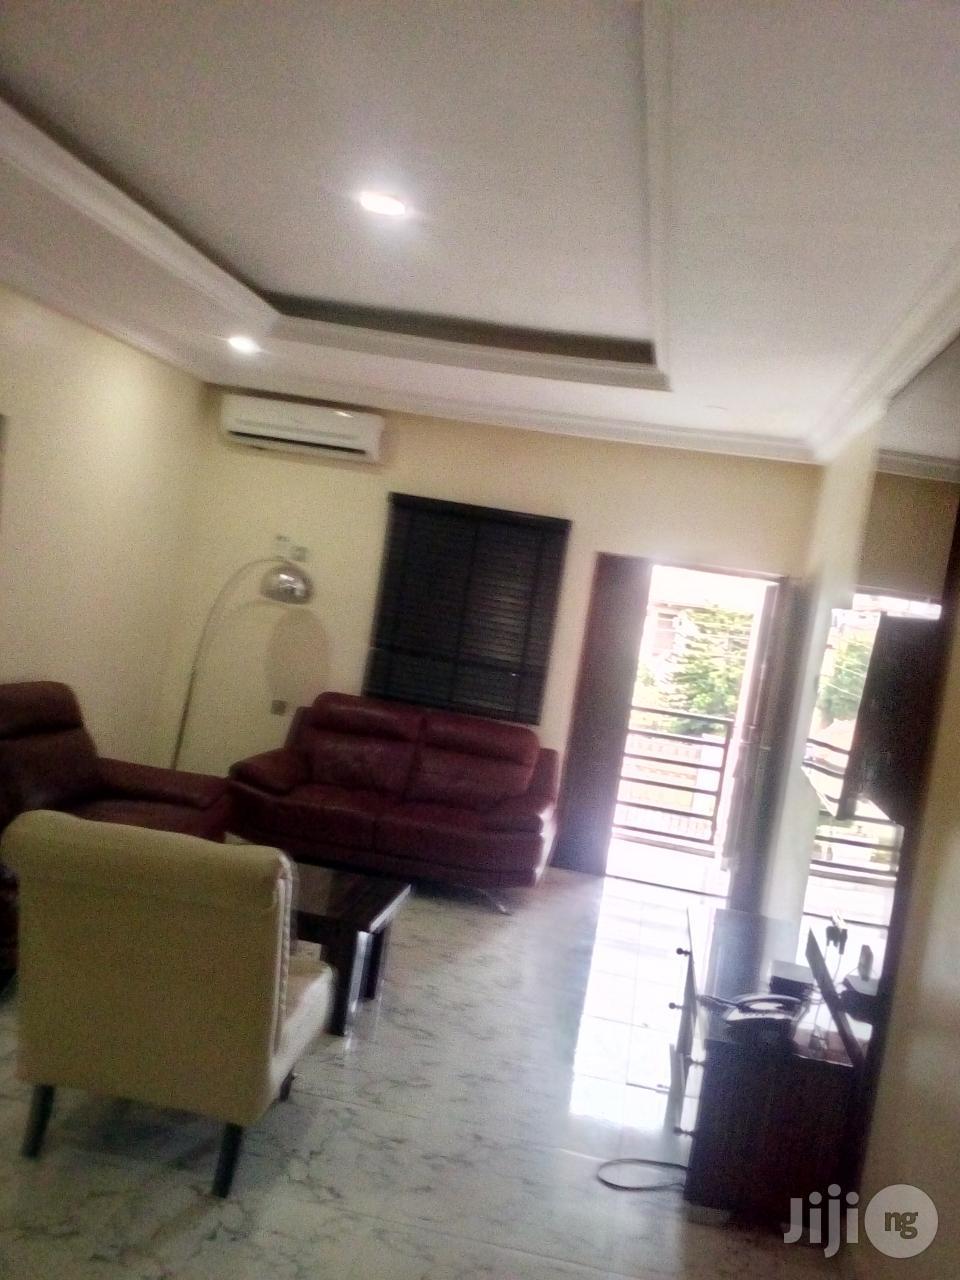 Service Apartment In The GRA Benin City   Short Let for sale in Benin City, Edo State, Nigeria